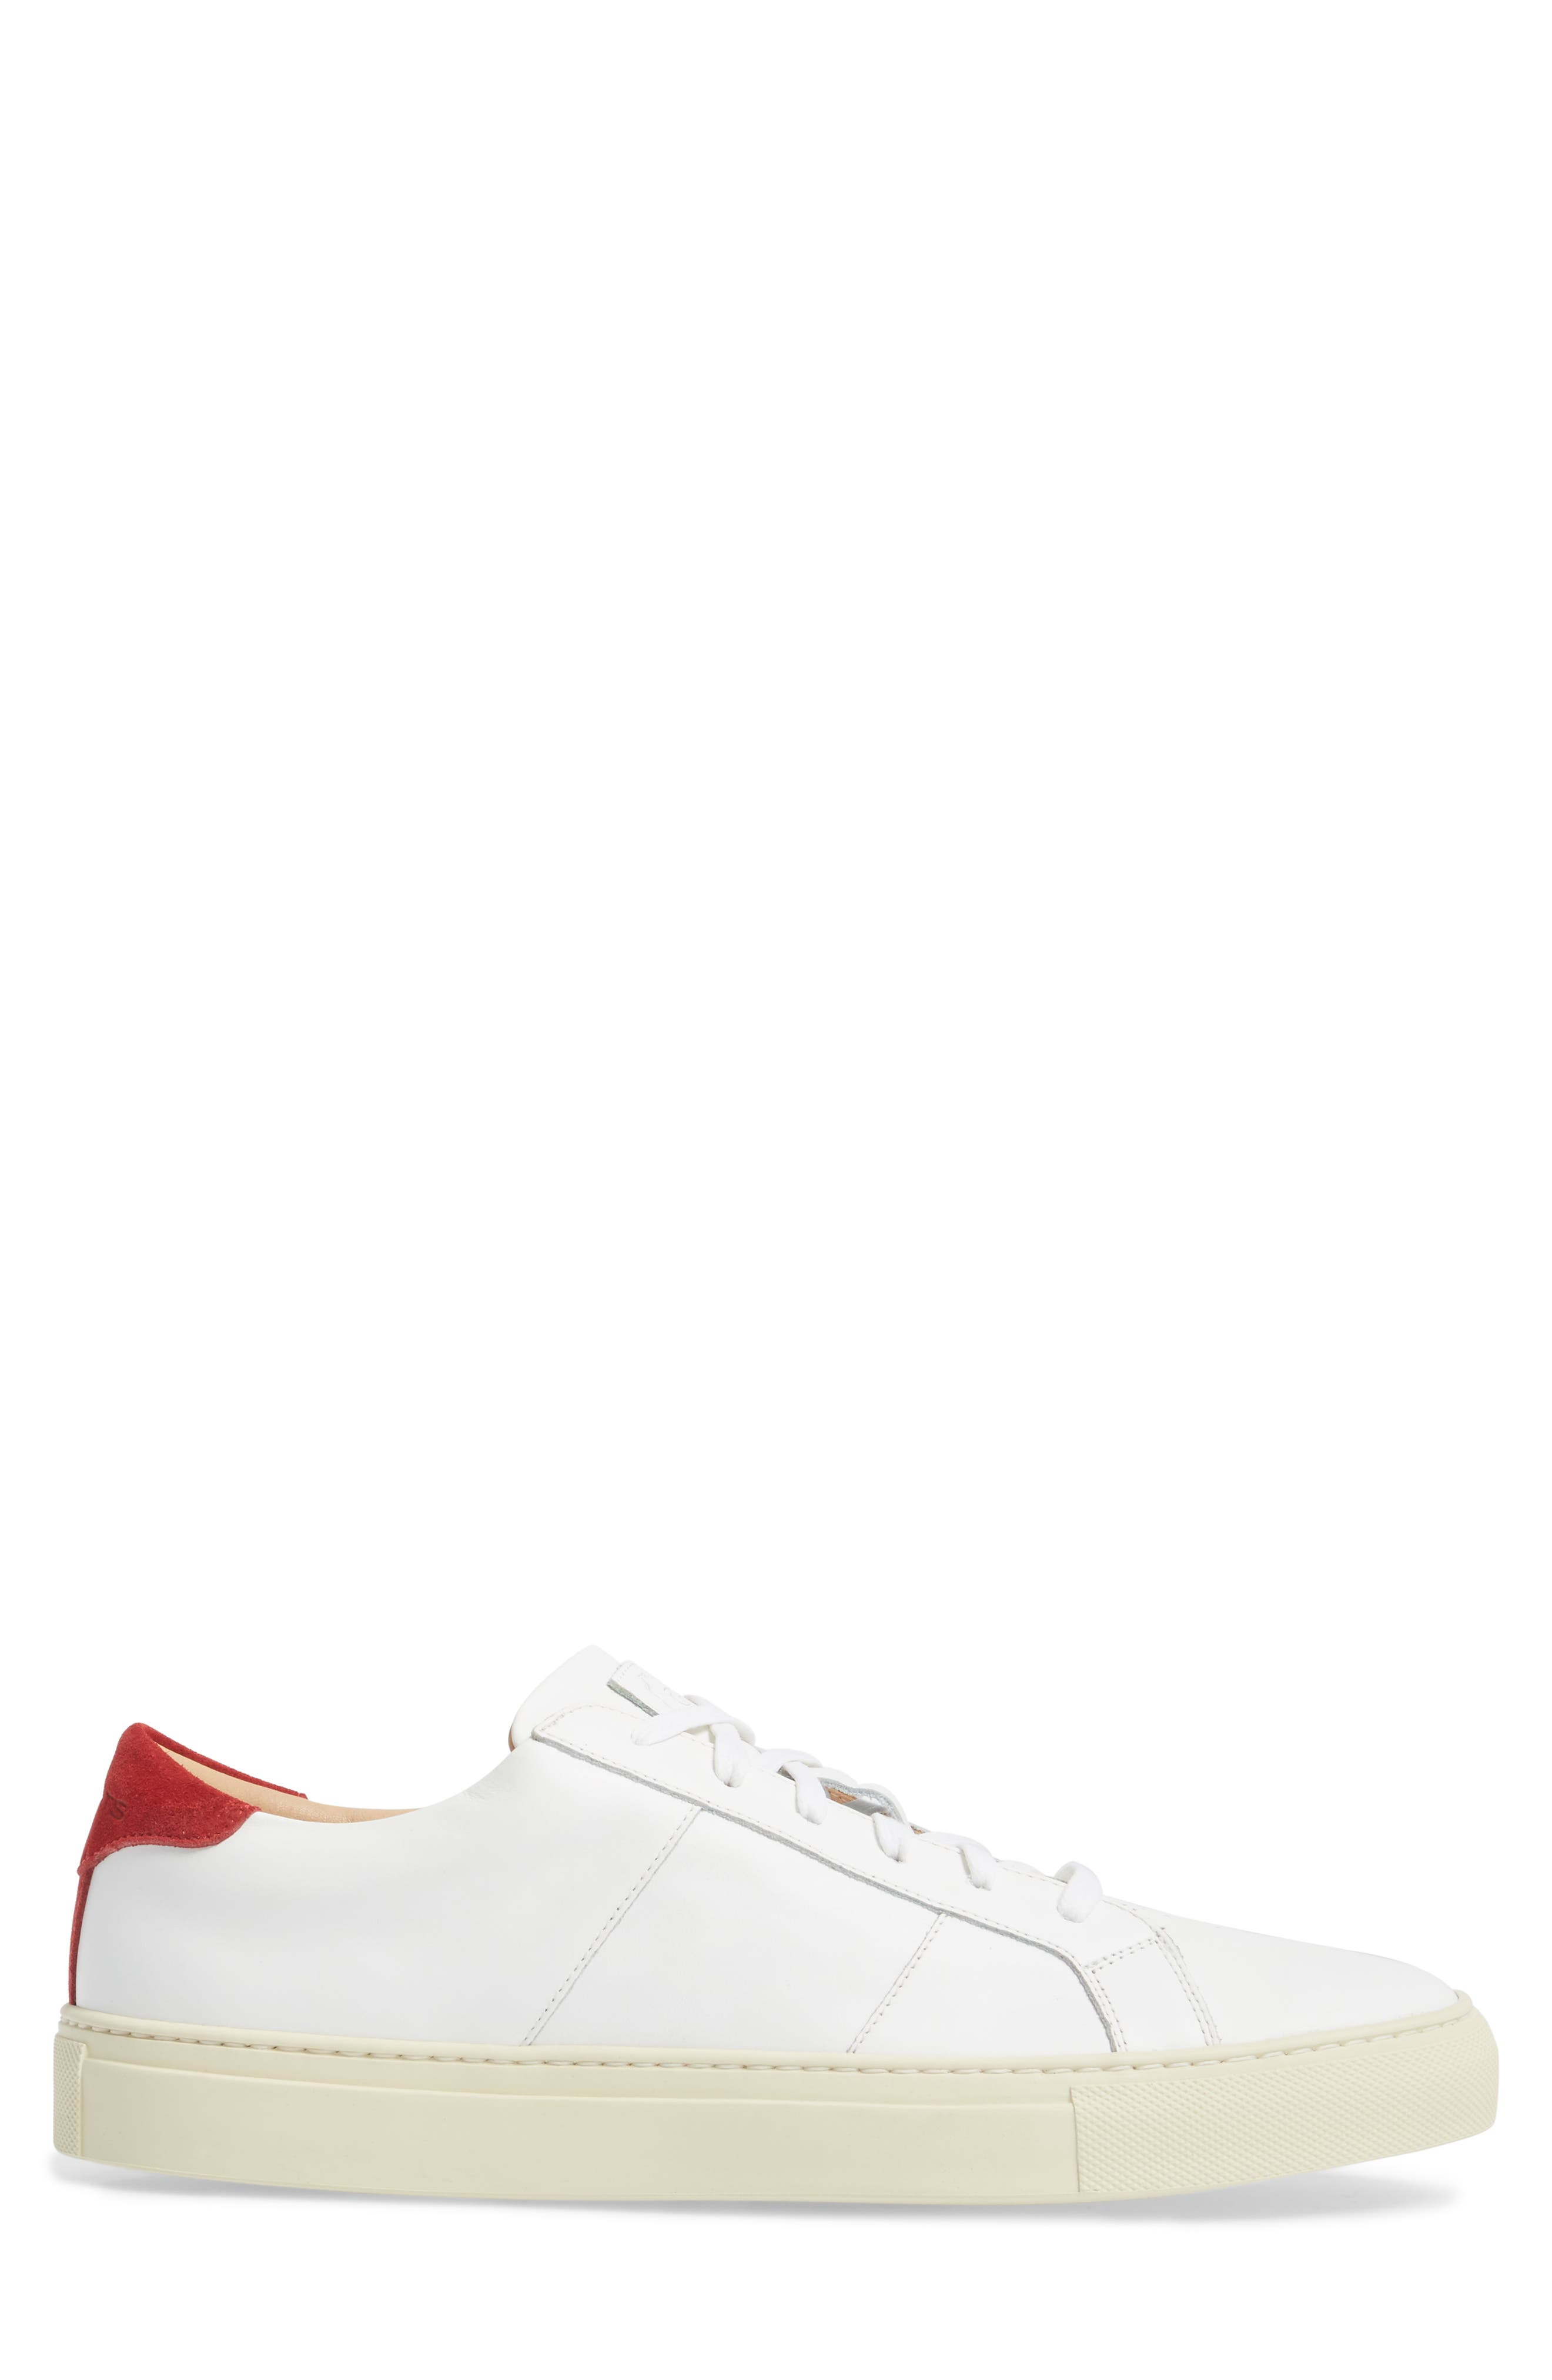 Alternate Image 3  - Greats Royale Vintage Low Top Sneaker (Men) (Nordstrom Exclusive)